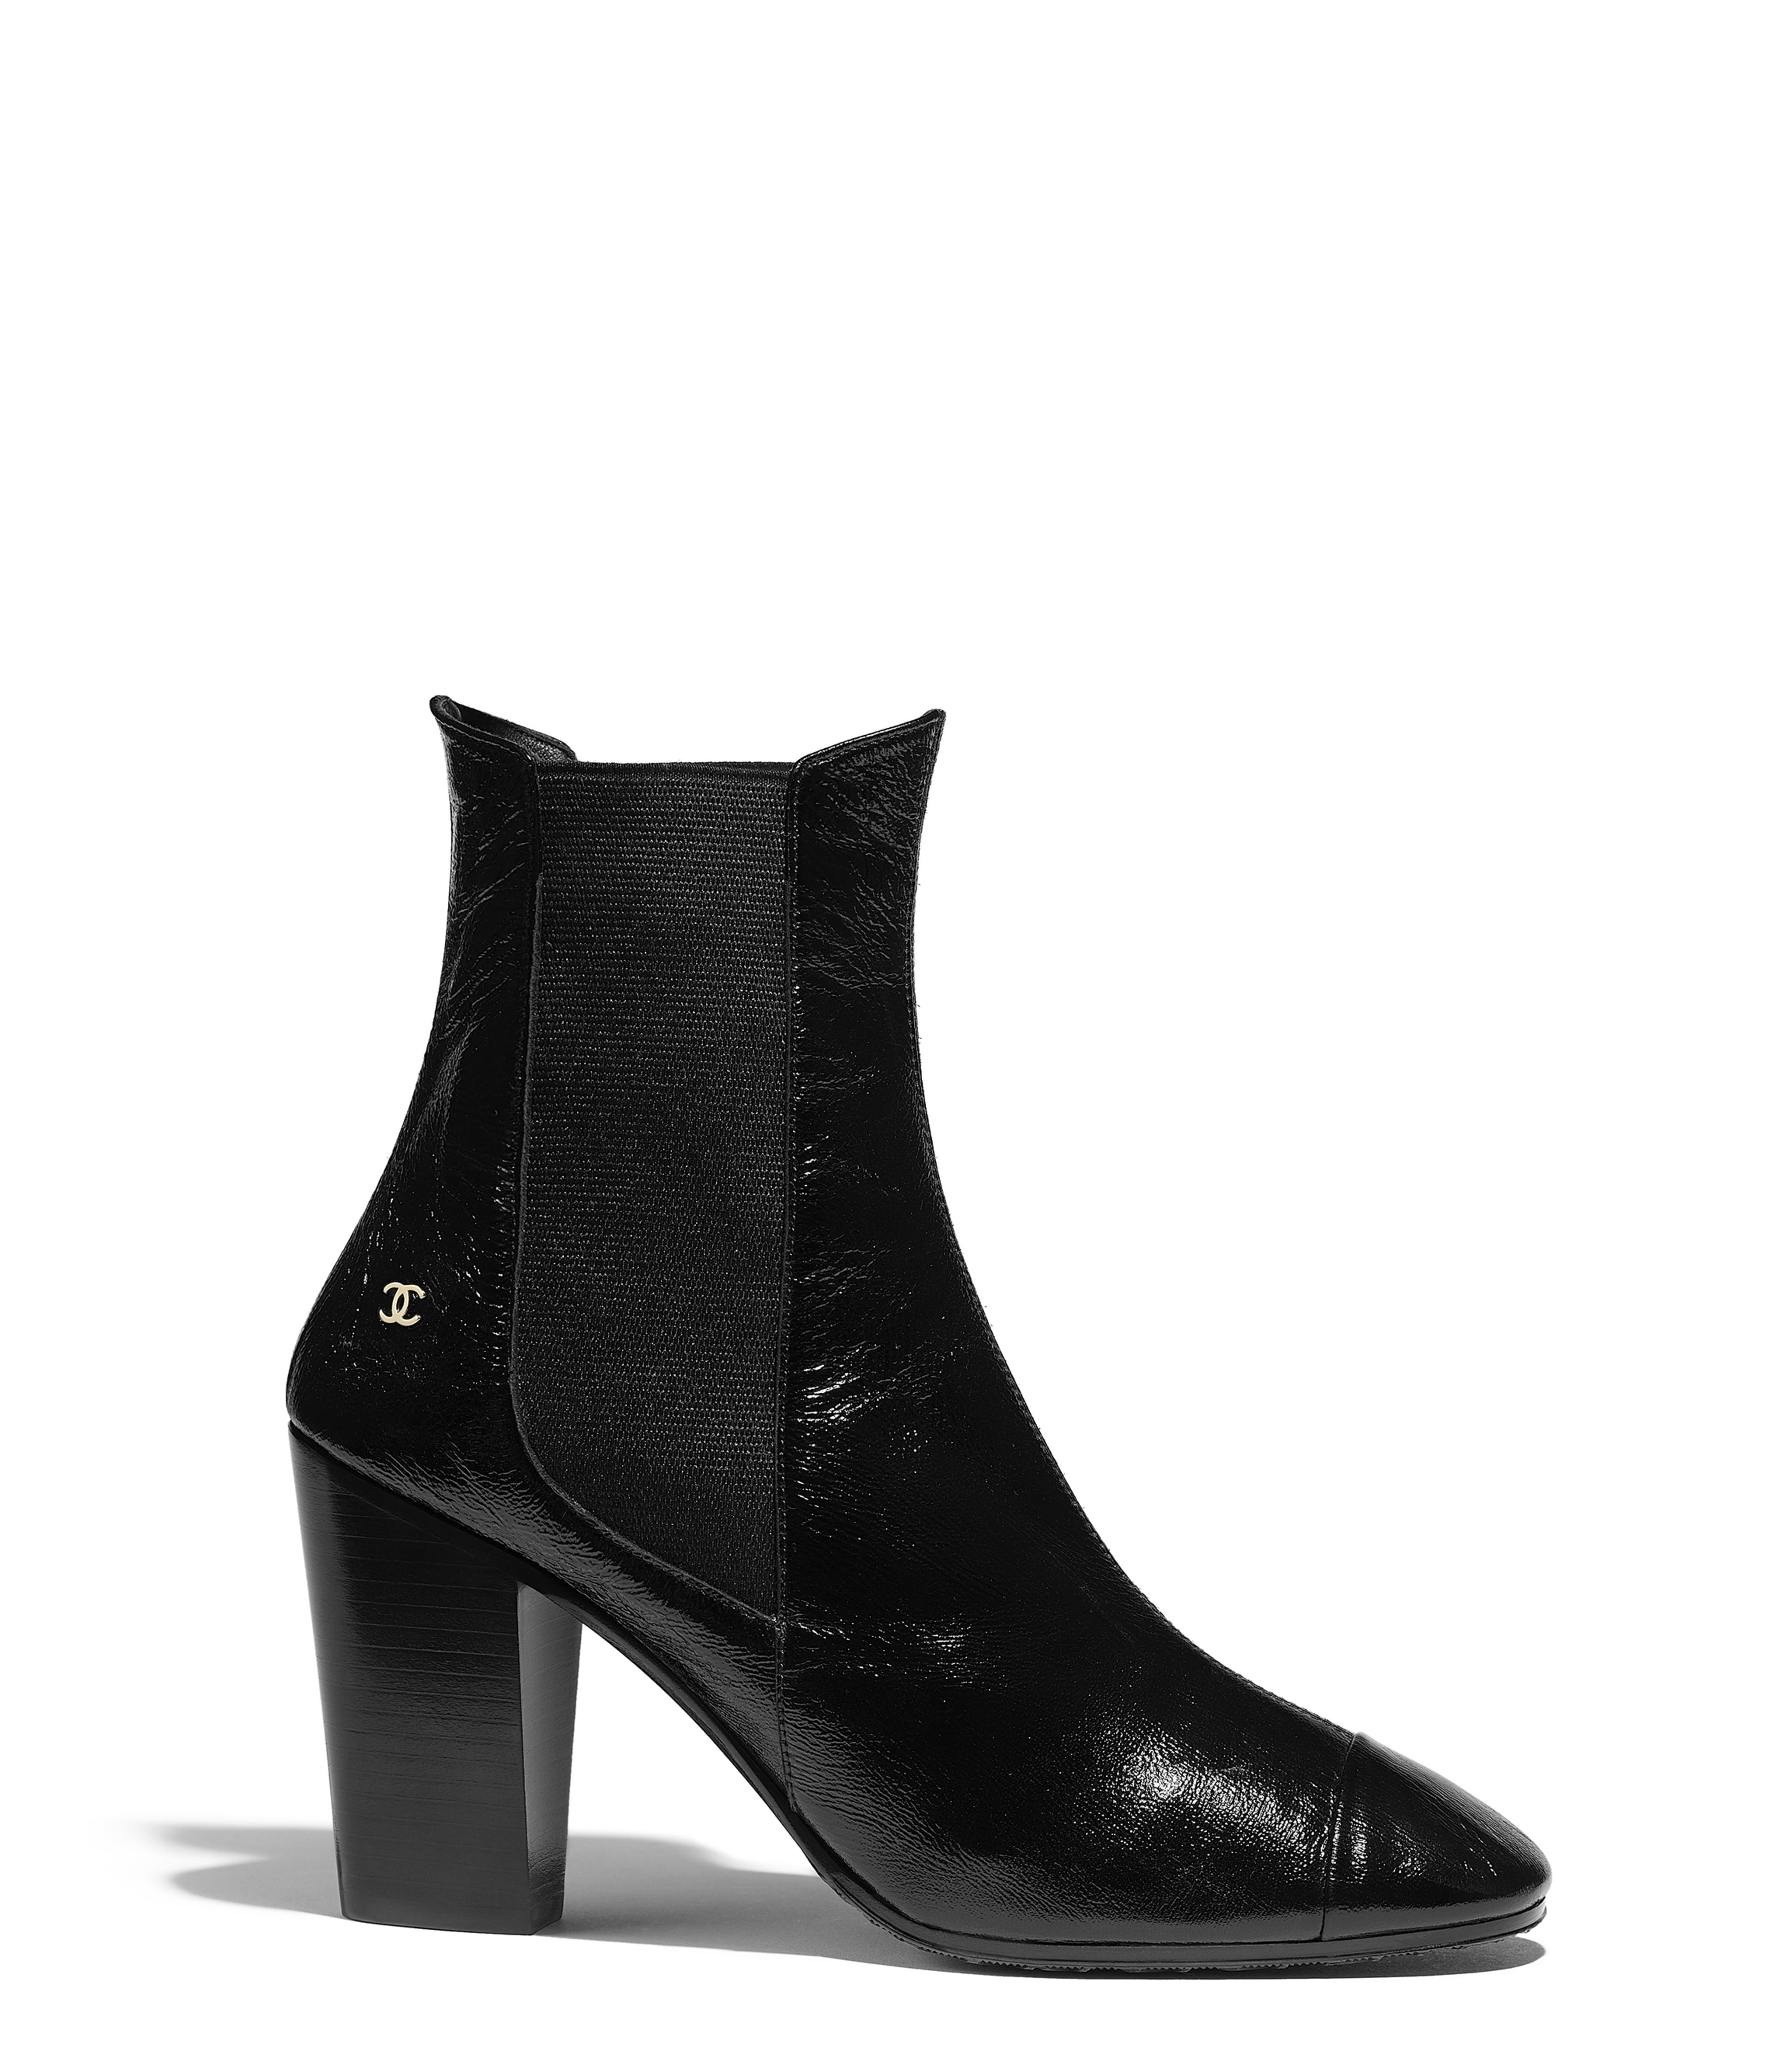 c682ae4be68cb6 Short Boots Patent Lambskin